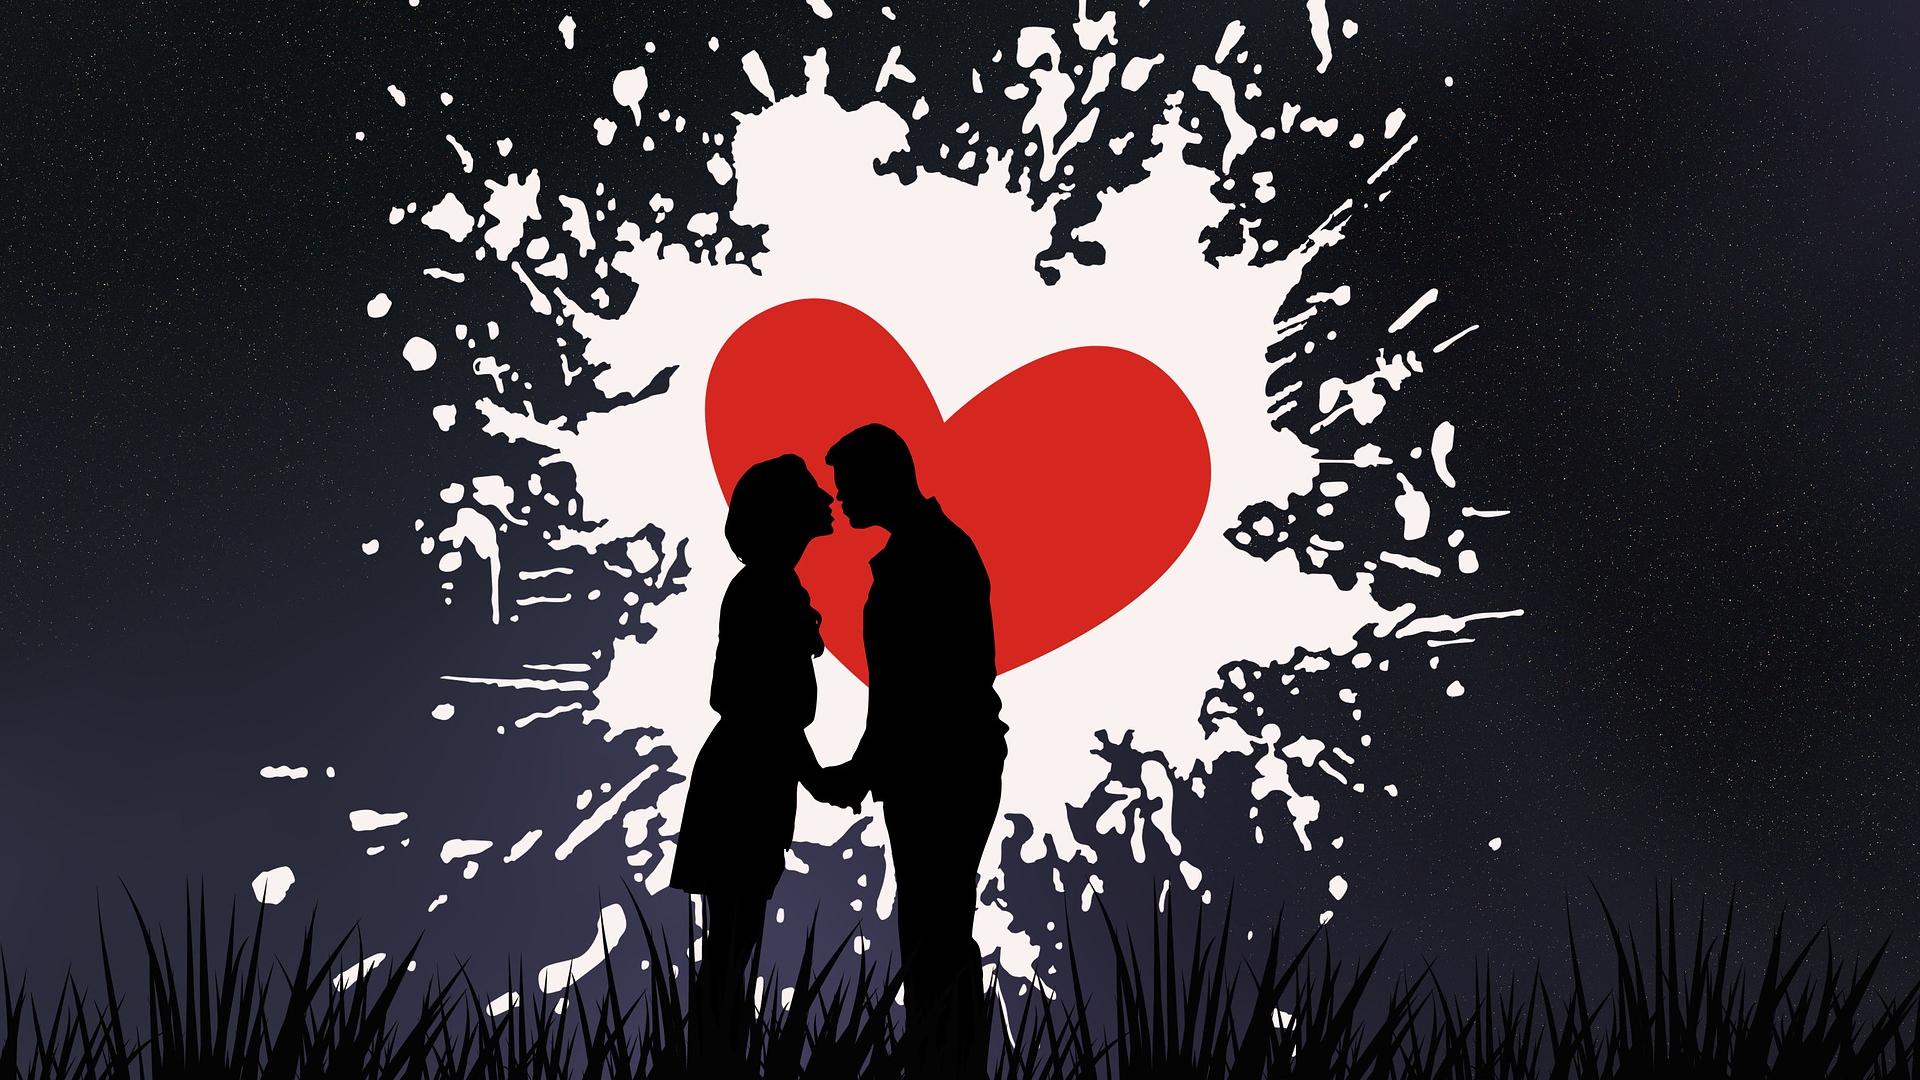 Love Images HD PC Wallpaper HD